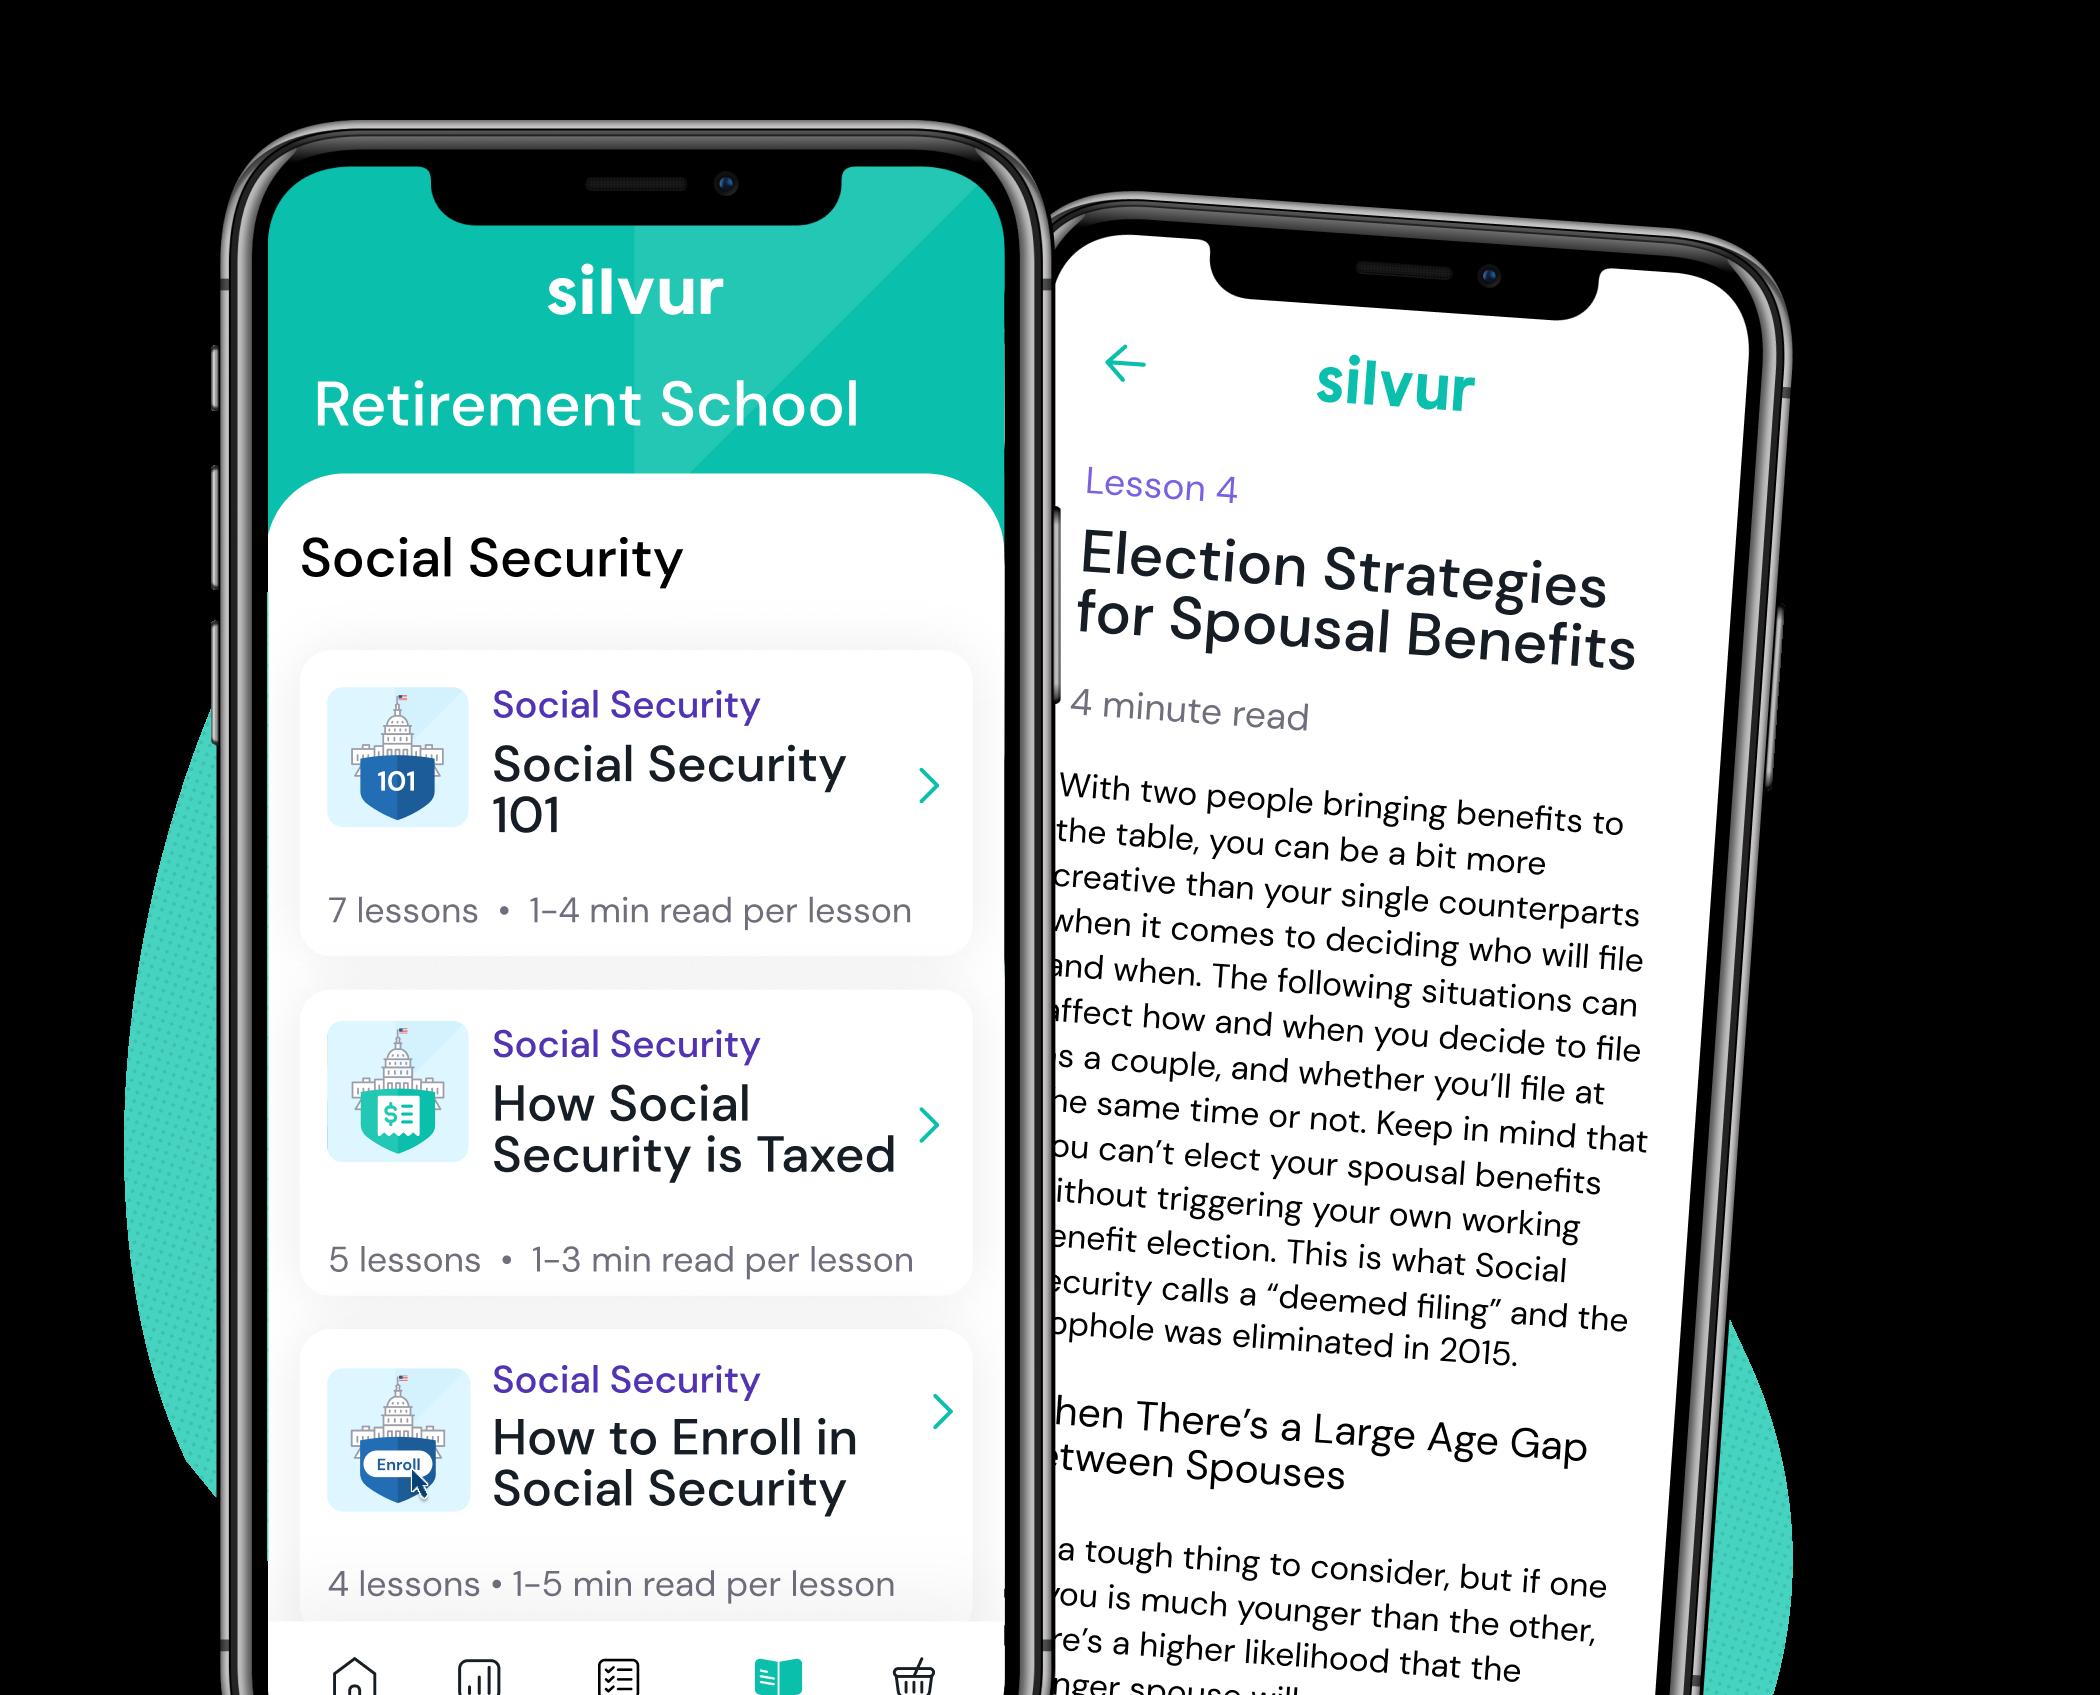 Silvur's Retirement School